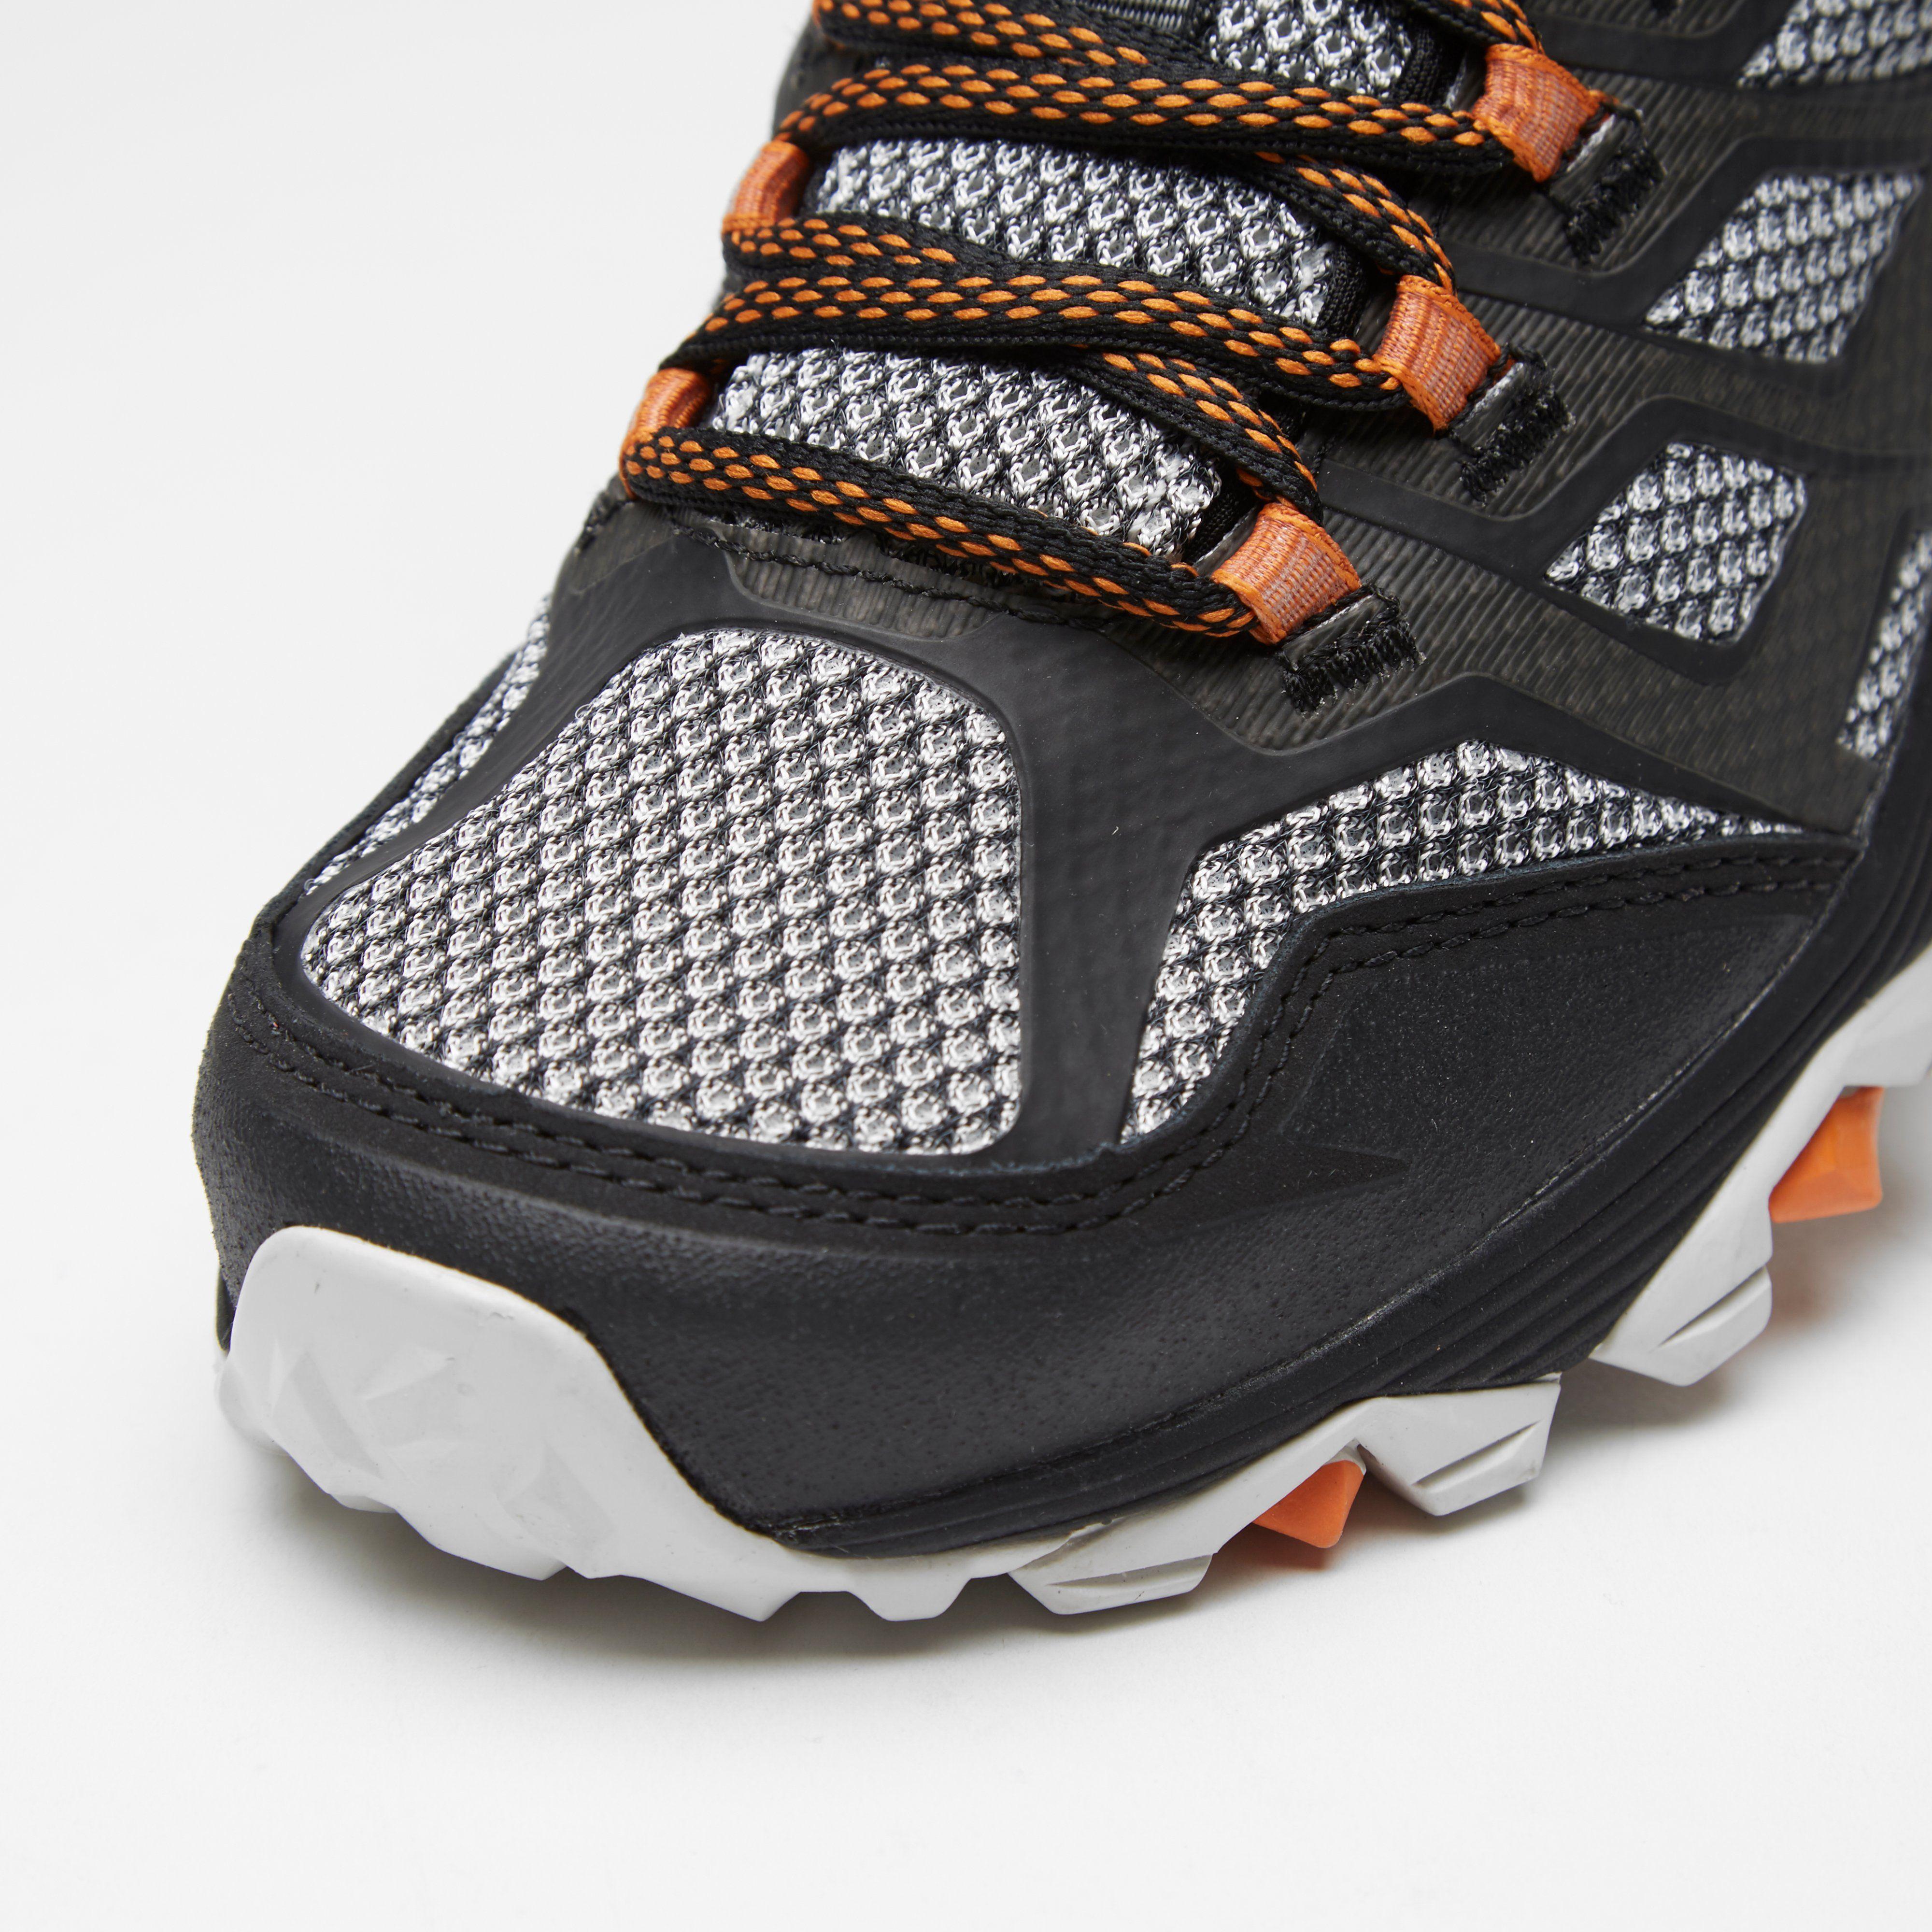 Merrell MOAB FST MID GTX Men's Walking Boots